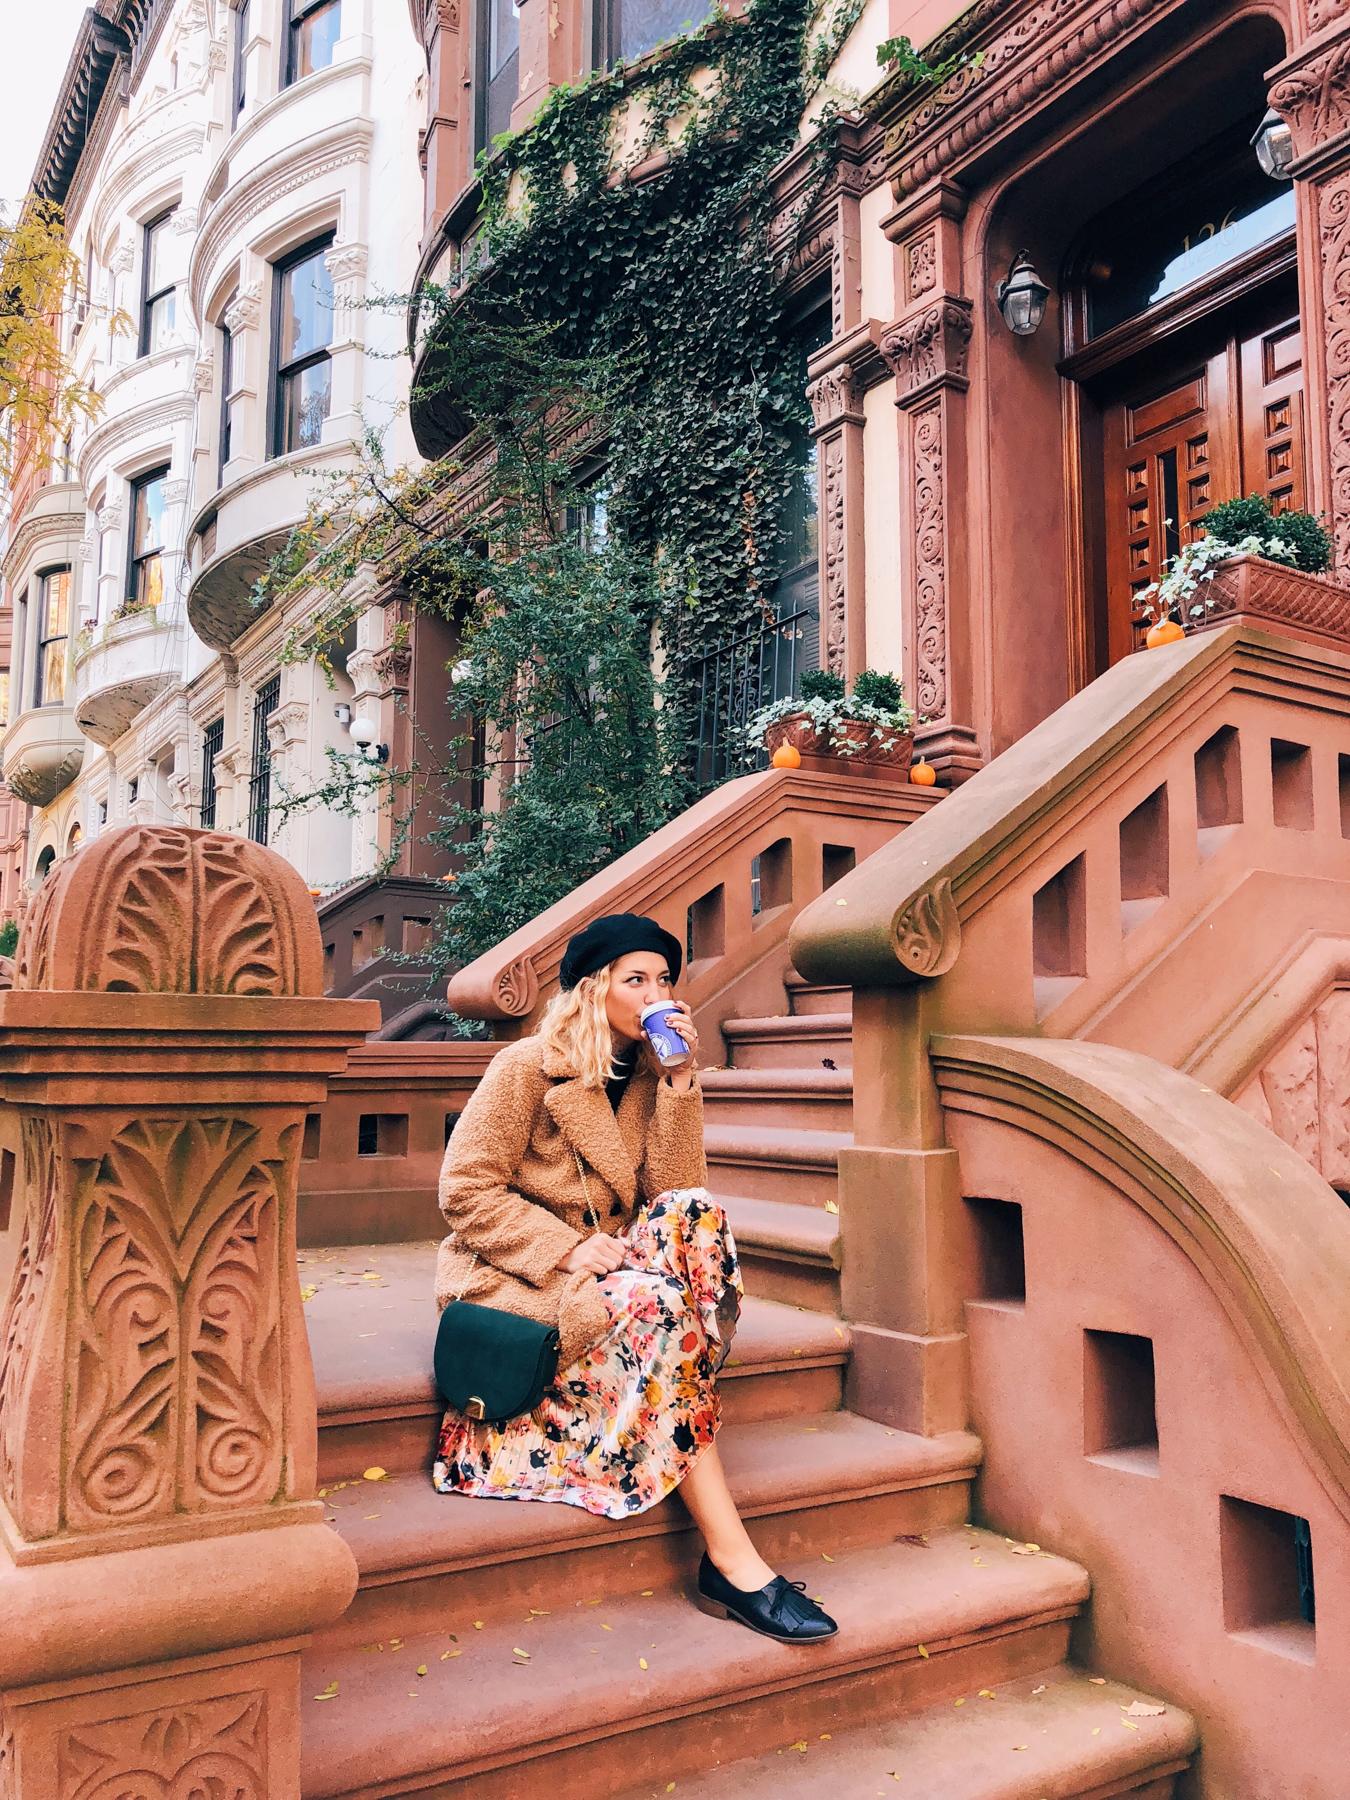 Upper West Side, near W 80th St.